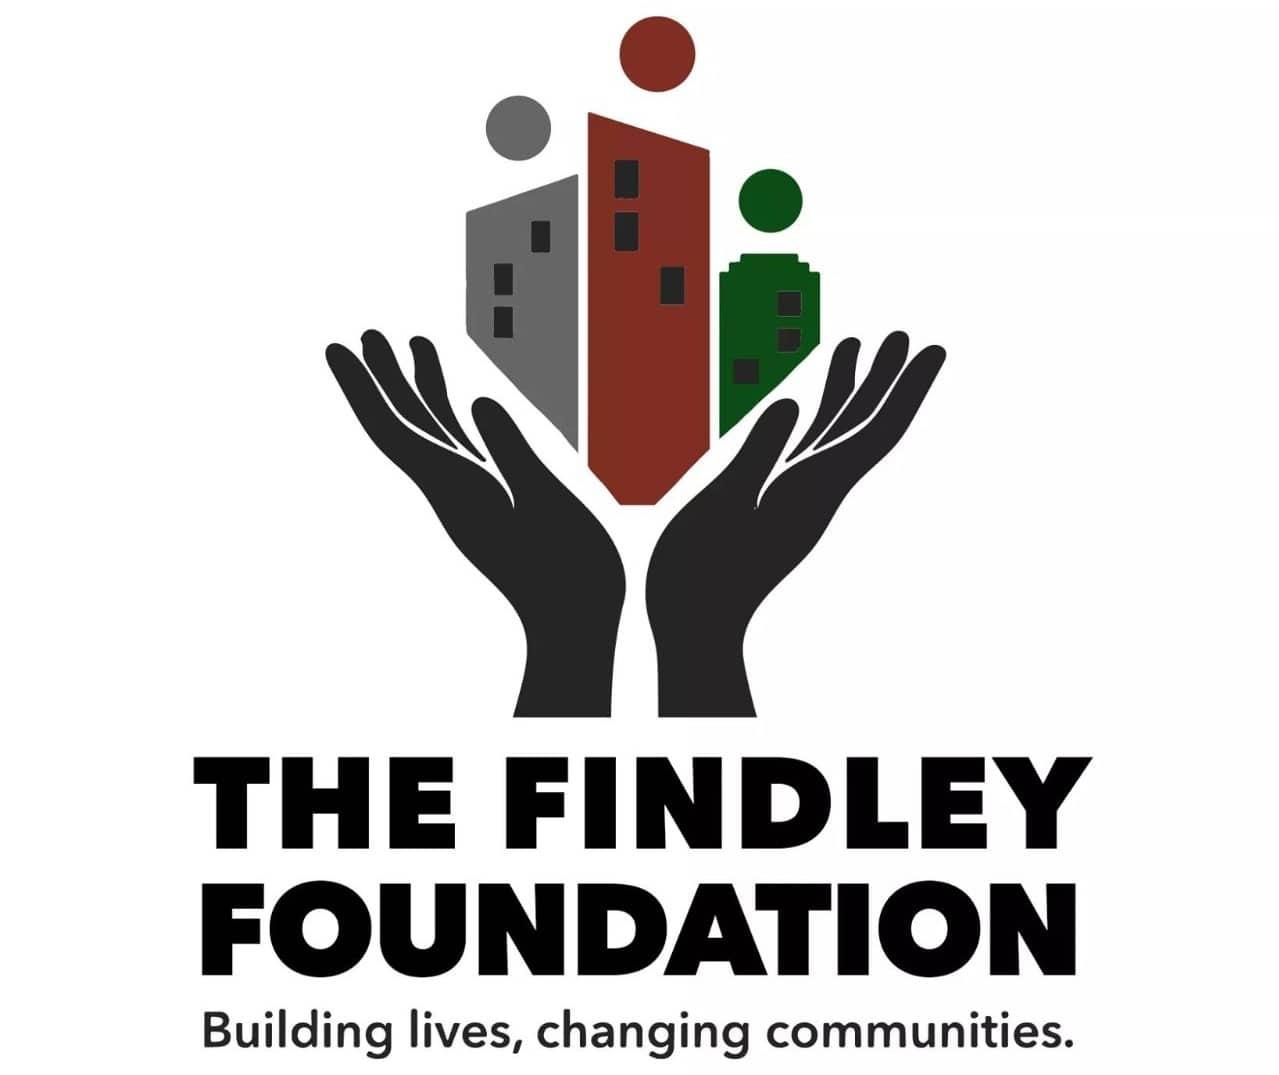 The Findley Foundation logo